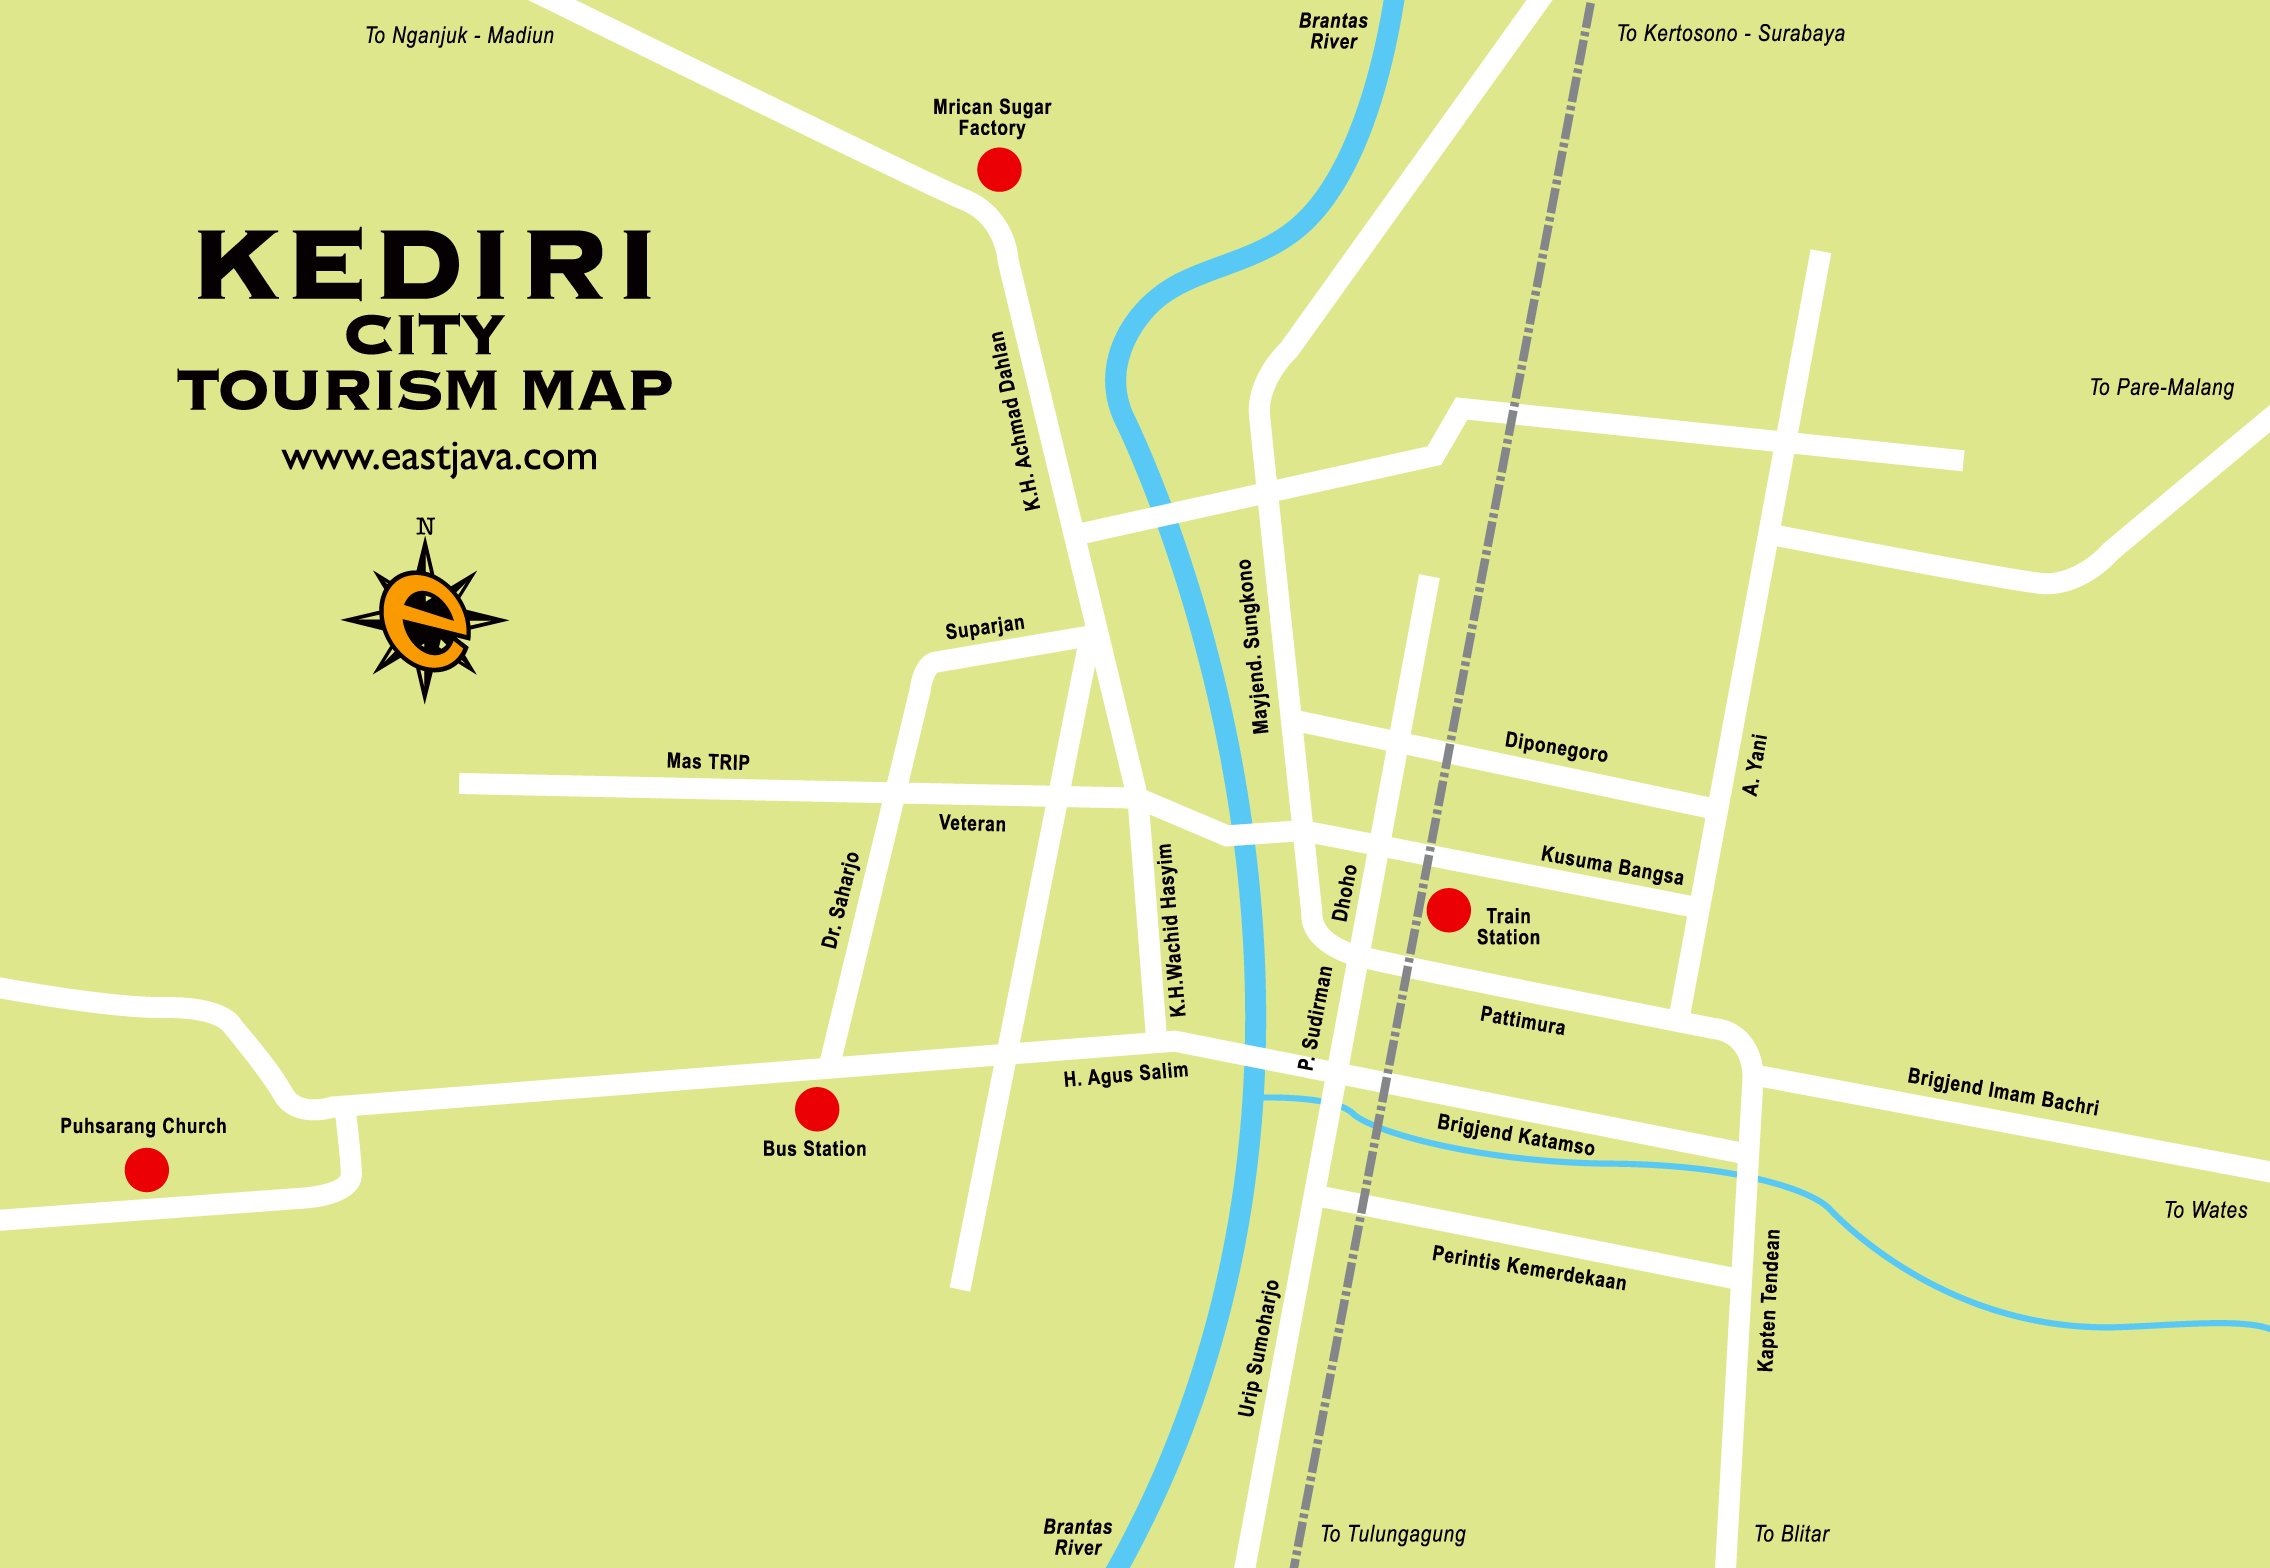 Kediri City Tourism Map Reflection Beauty Nature Presents Google Monumen